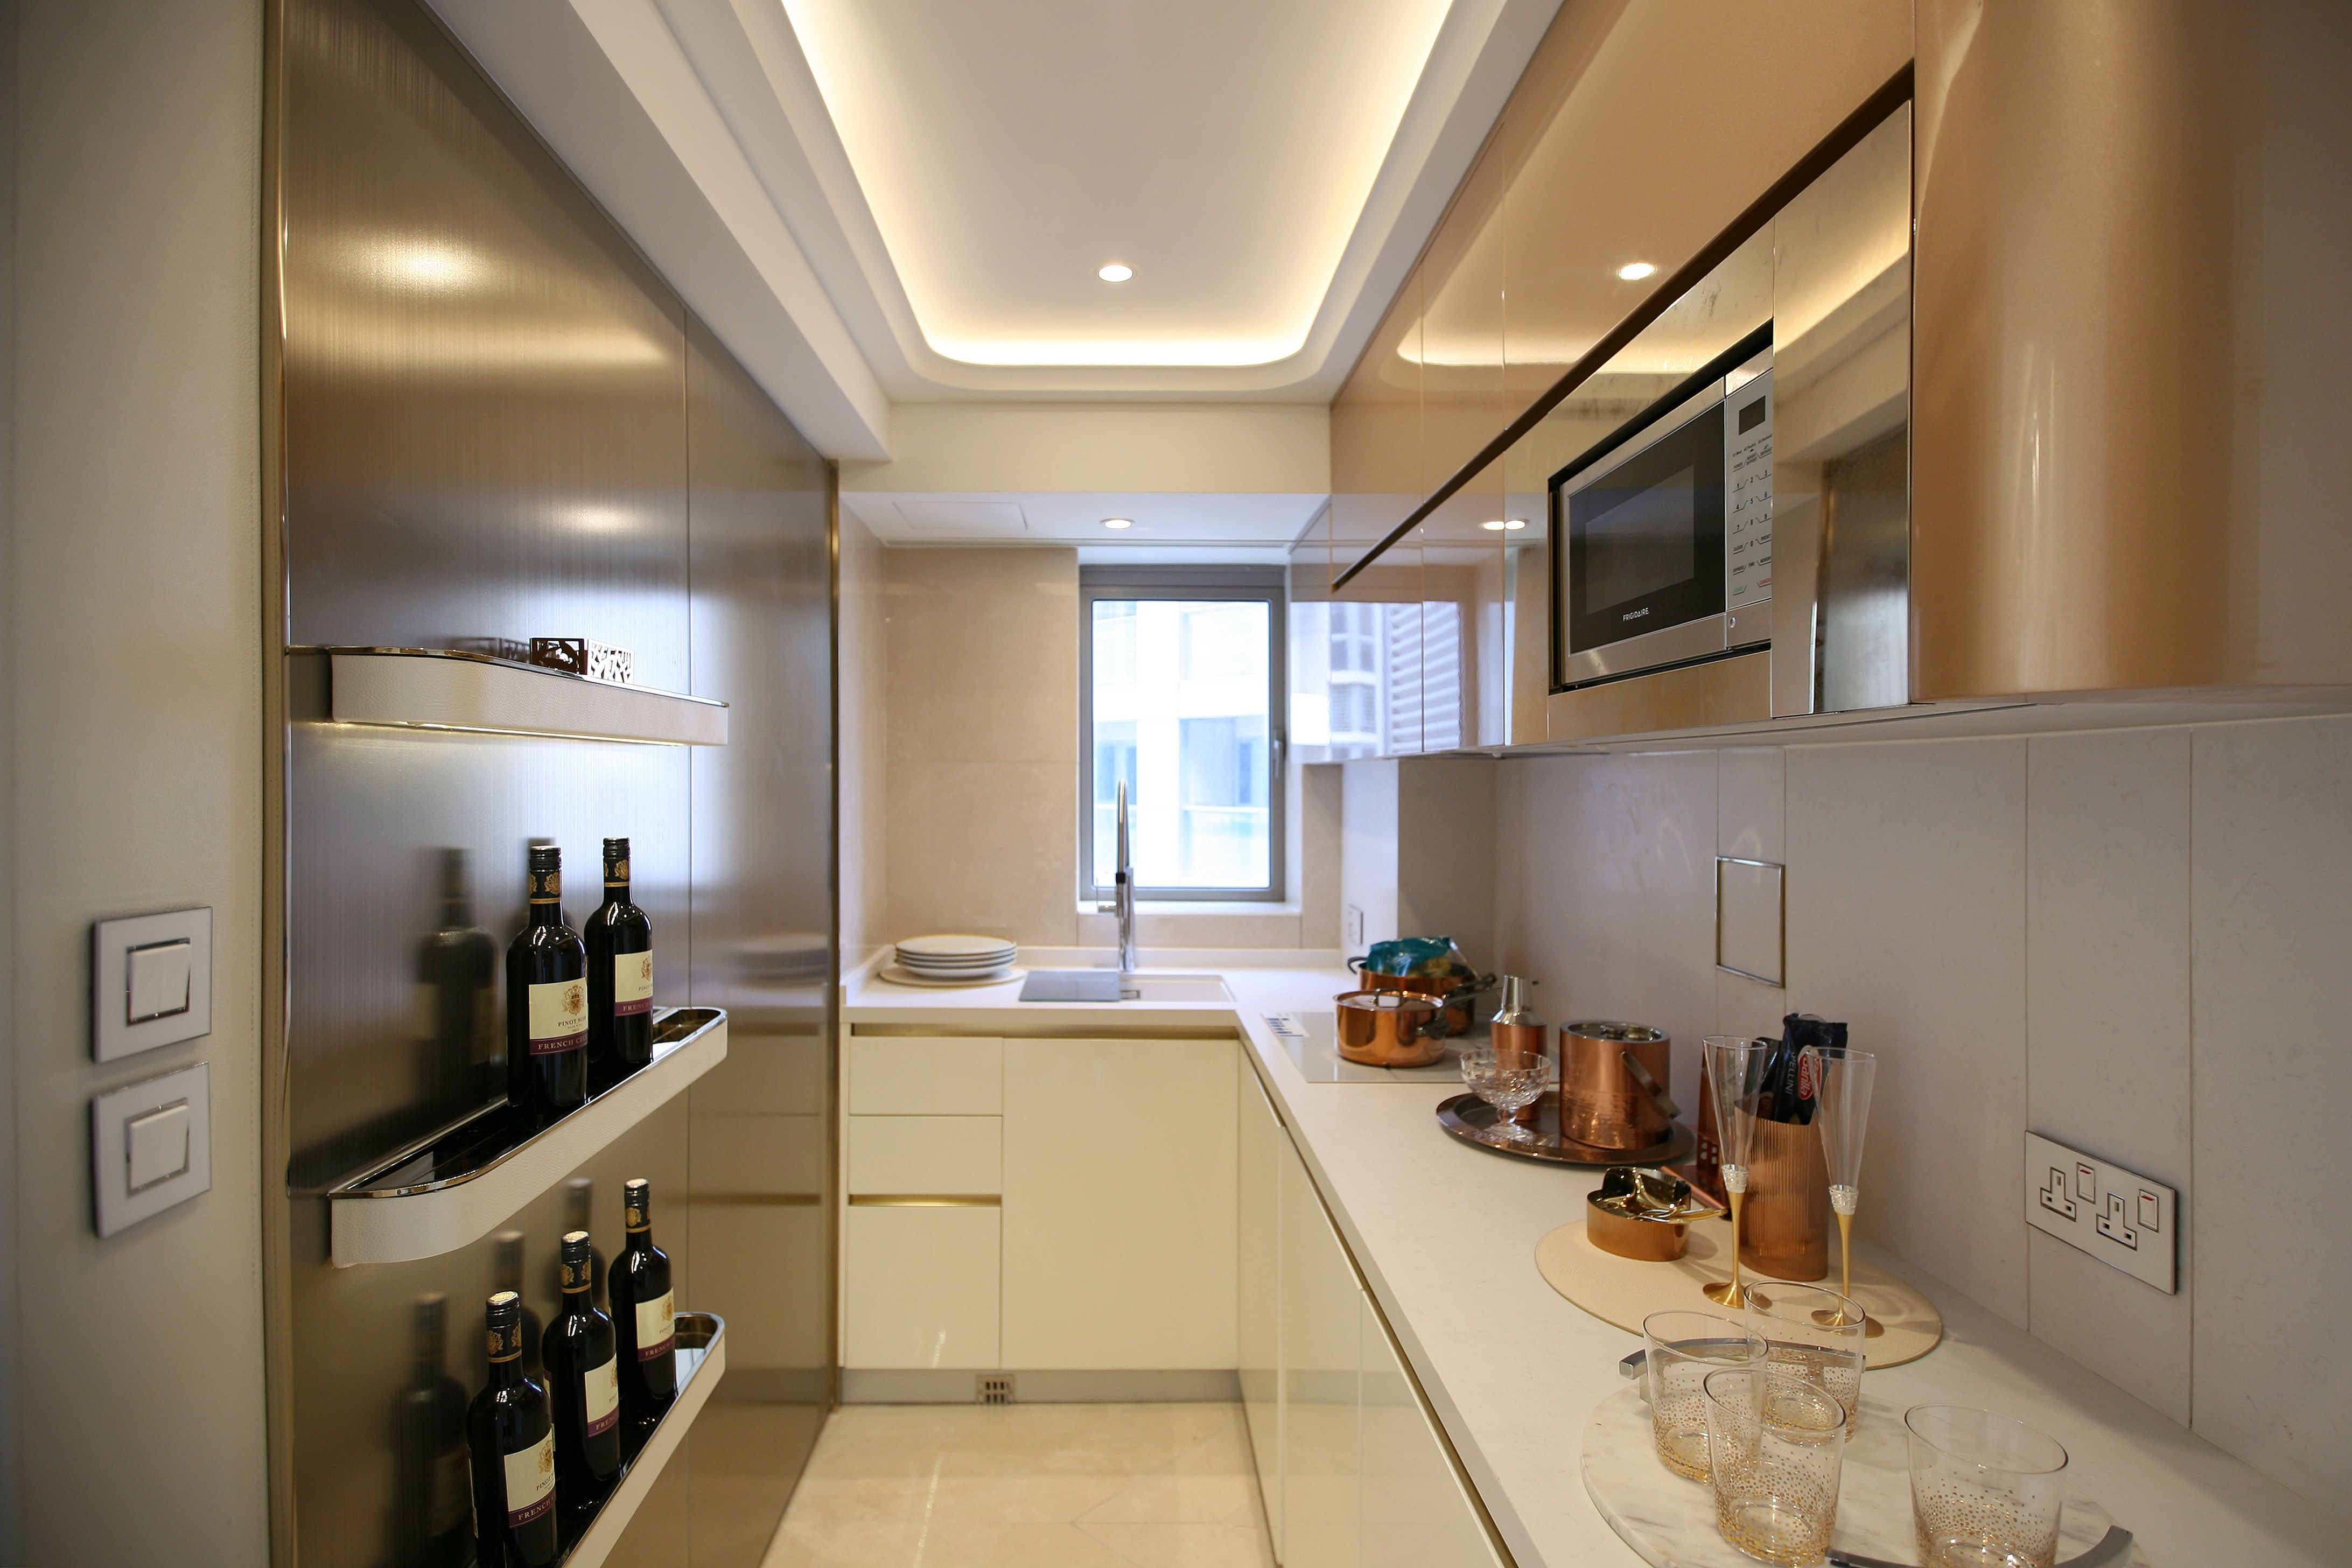 La Marina Show Flat Macau Interior Design And Fitting Out Works